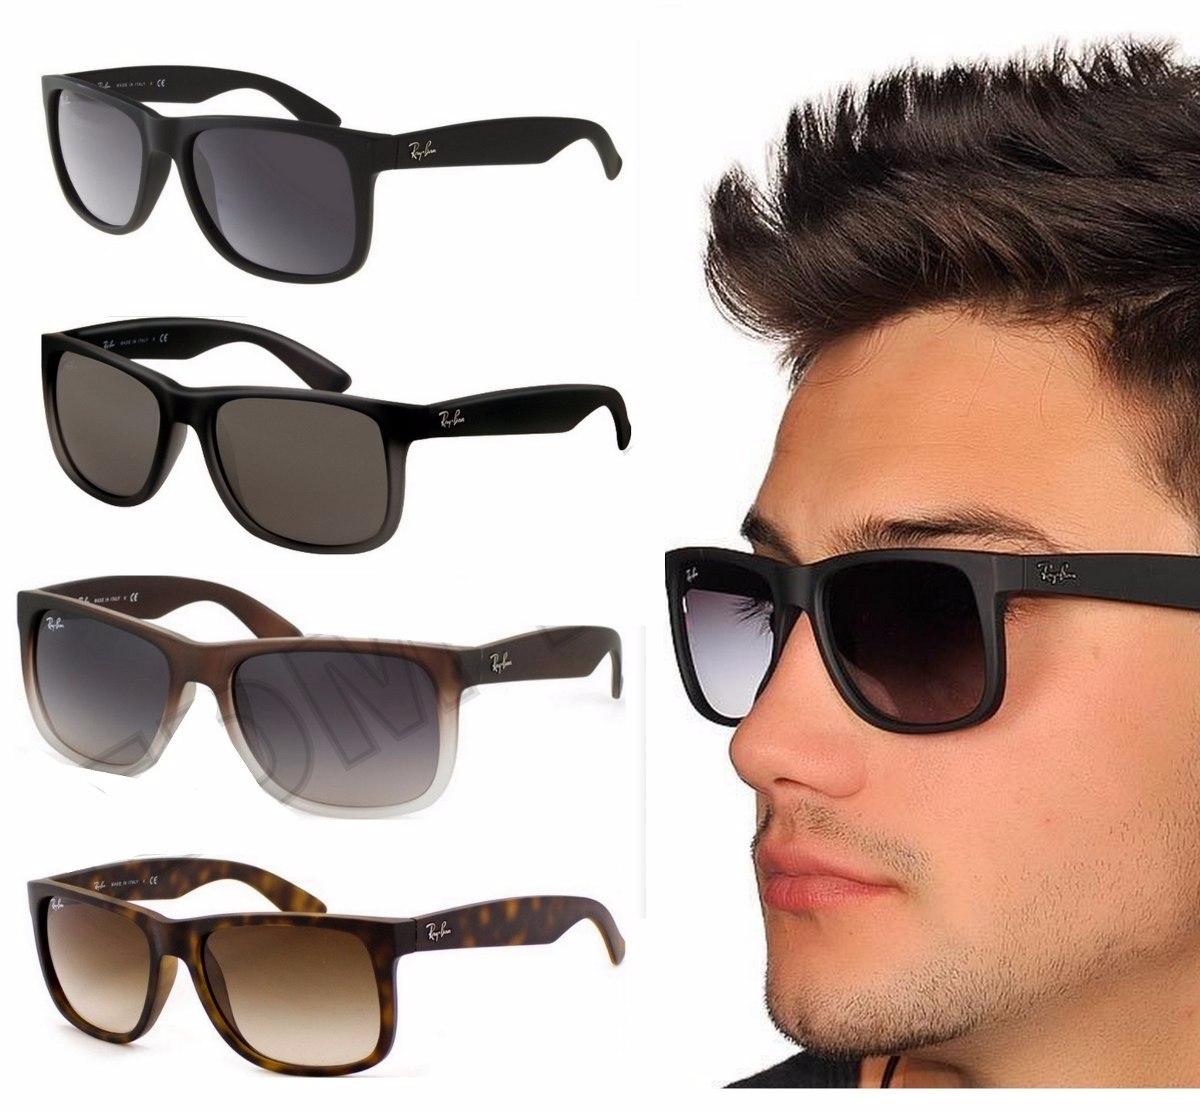 082dc96275211 oculos ray ban original masculino mercadolivre   ALPHATIER